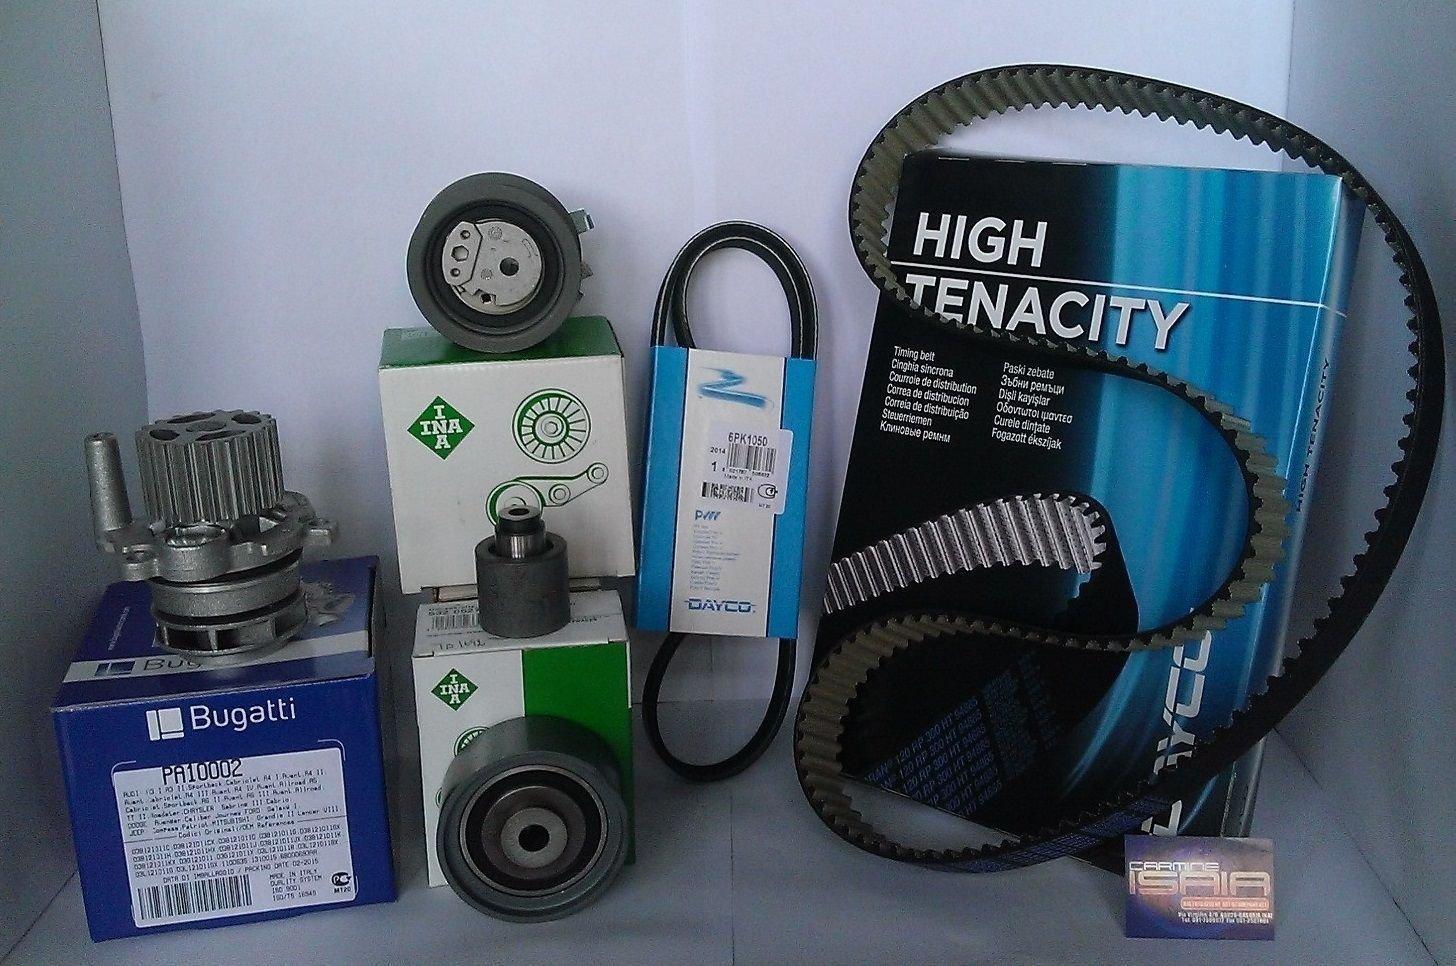 Kit distribución orig Ina (1 K1) 6pz + Bomba Agua + Correa Serv VW Golf V 2.0TDi: Amazon.es: Coche y moto